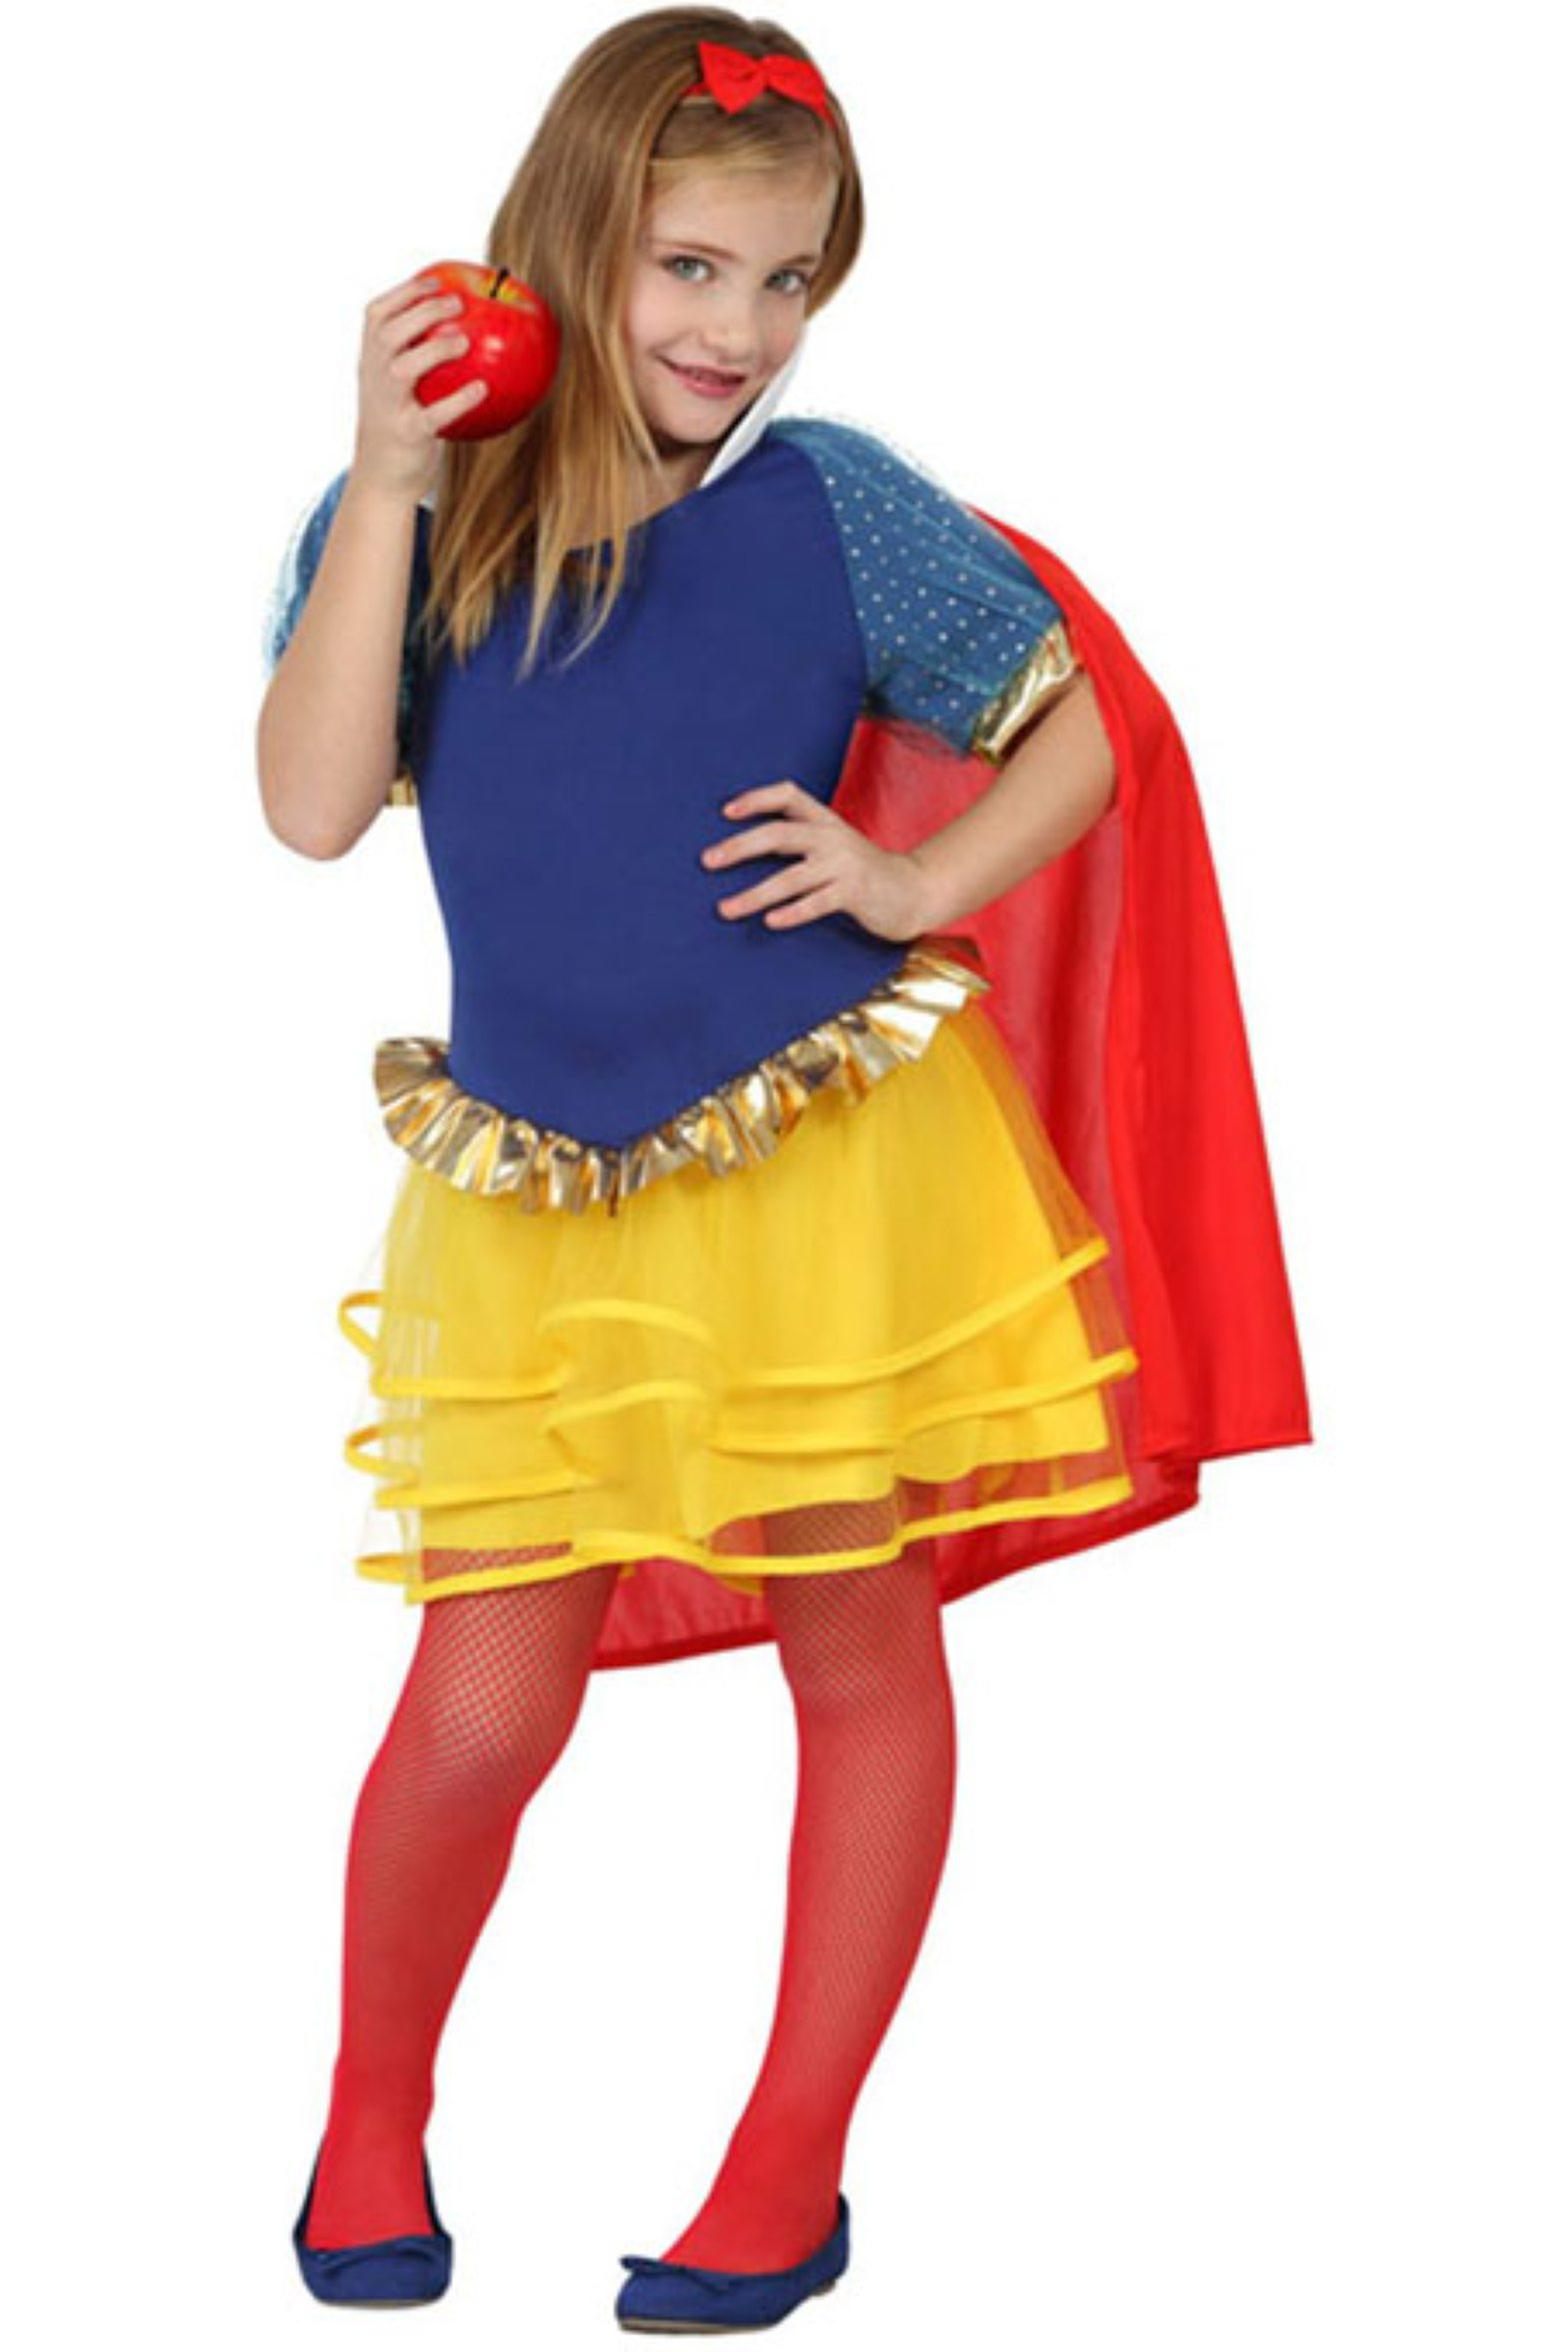 Faschingskostume Fur Kinder Prinzessin Kostum Fruugo